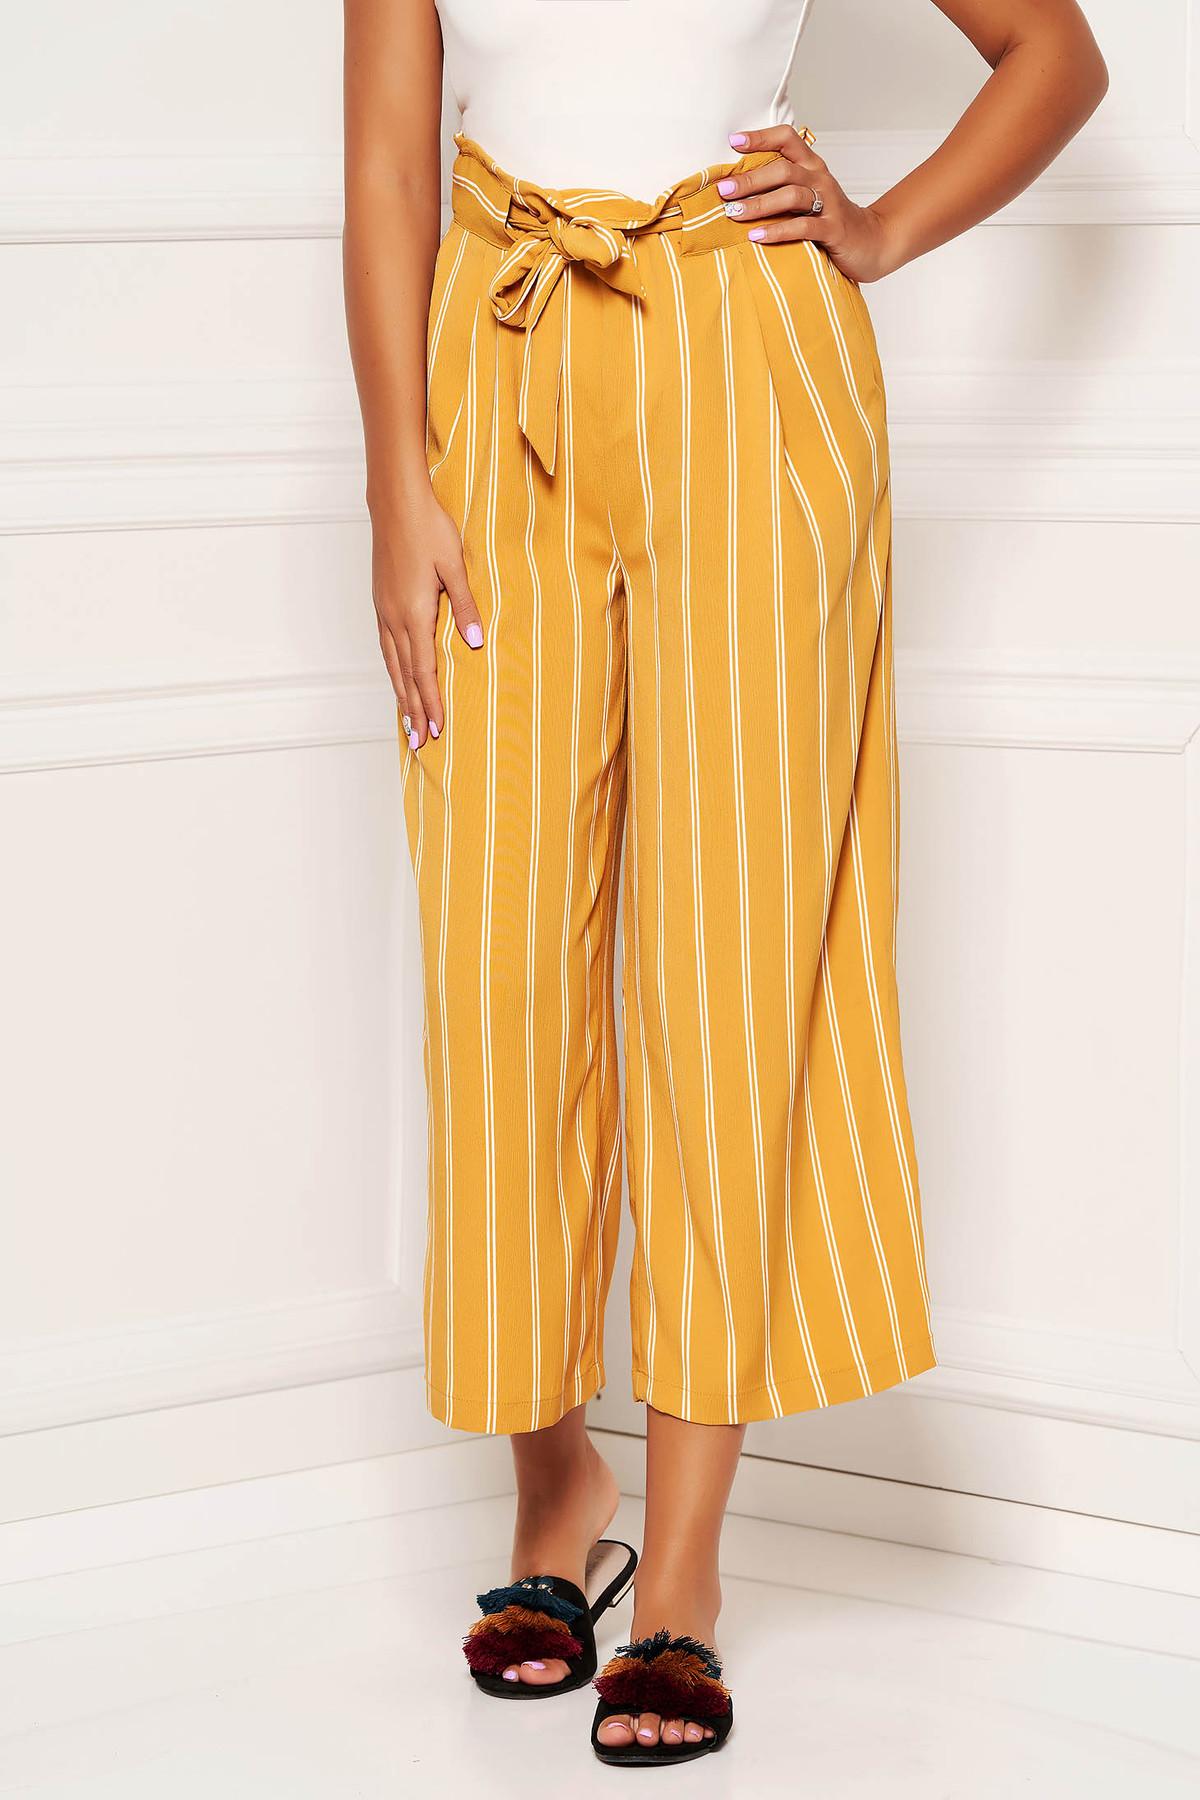 Pantaloni SunShine mustarii cu un croi drept si elastic in talie